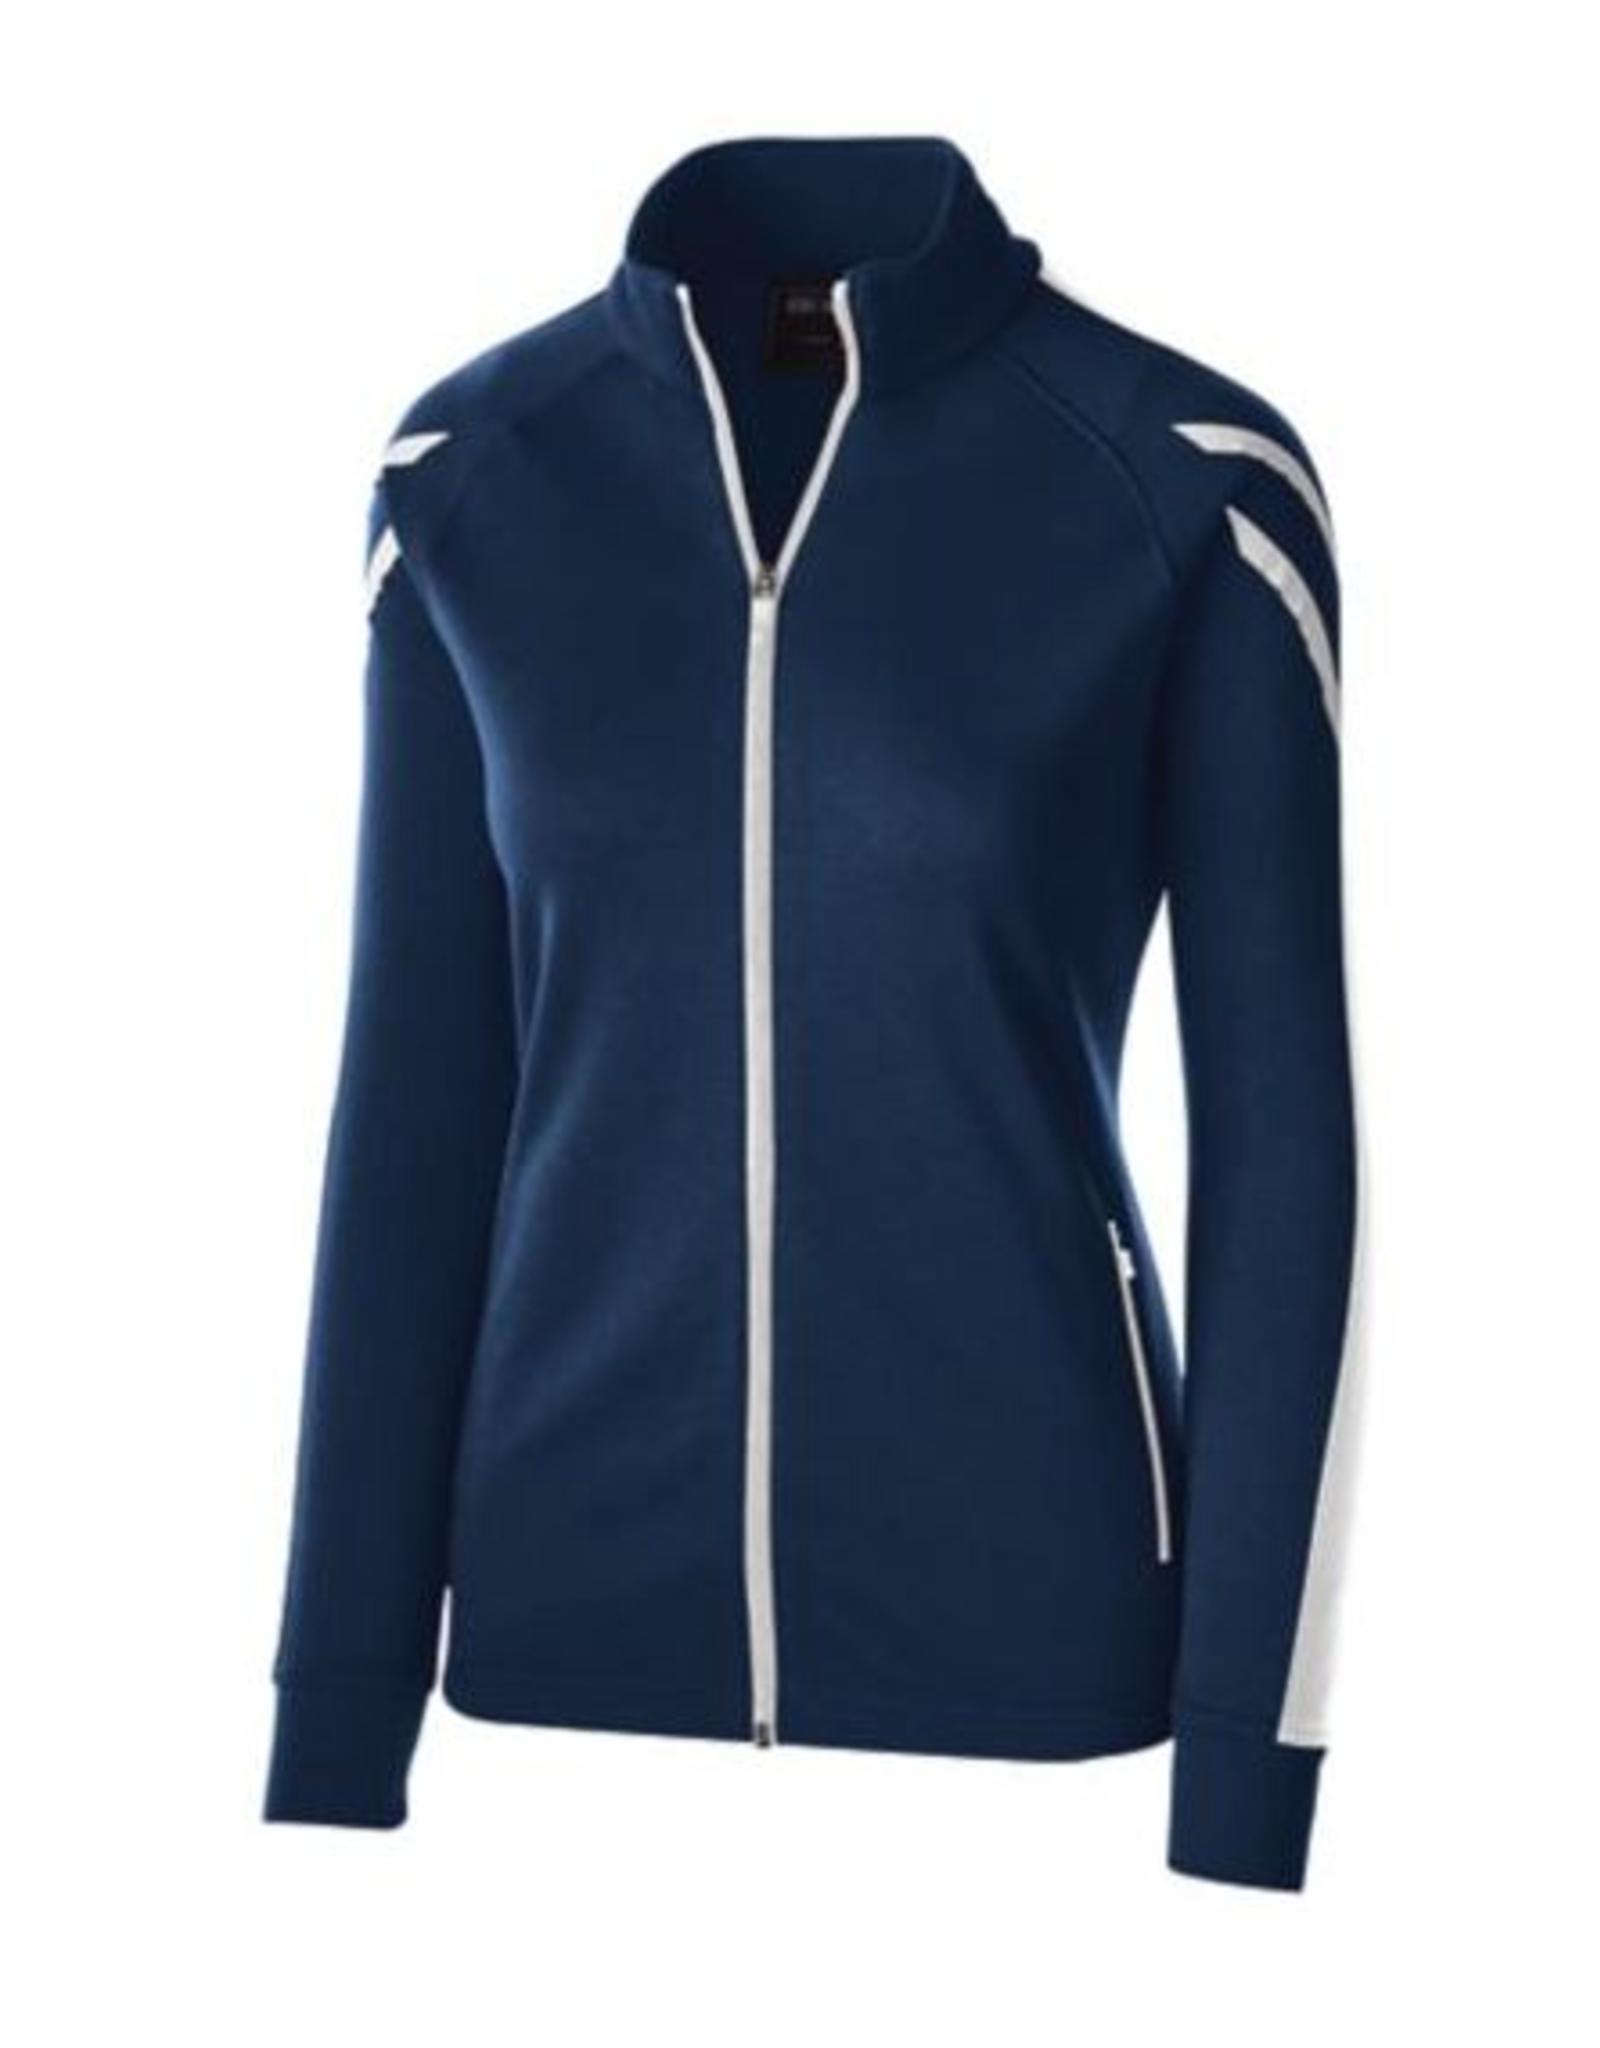 NON-UNIFORM JACKET - Ladies Flux jacket with custom embroidery - P-26432